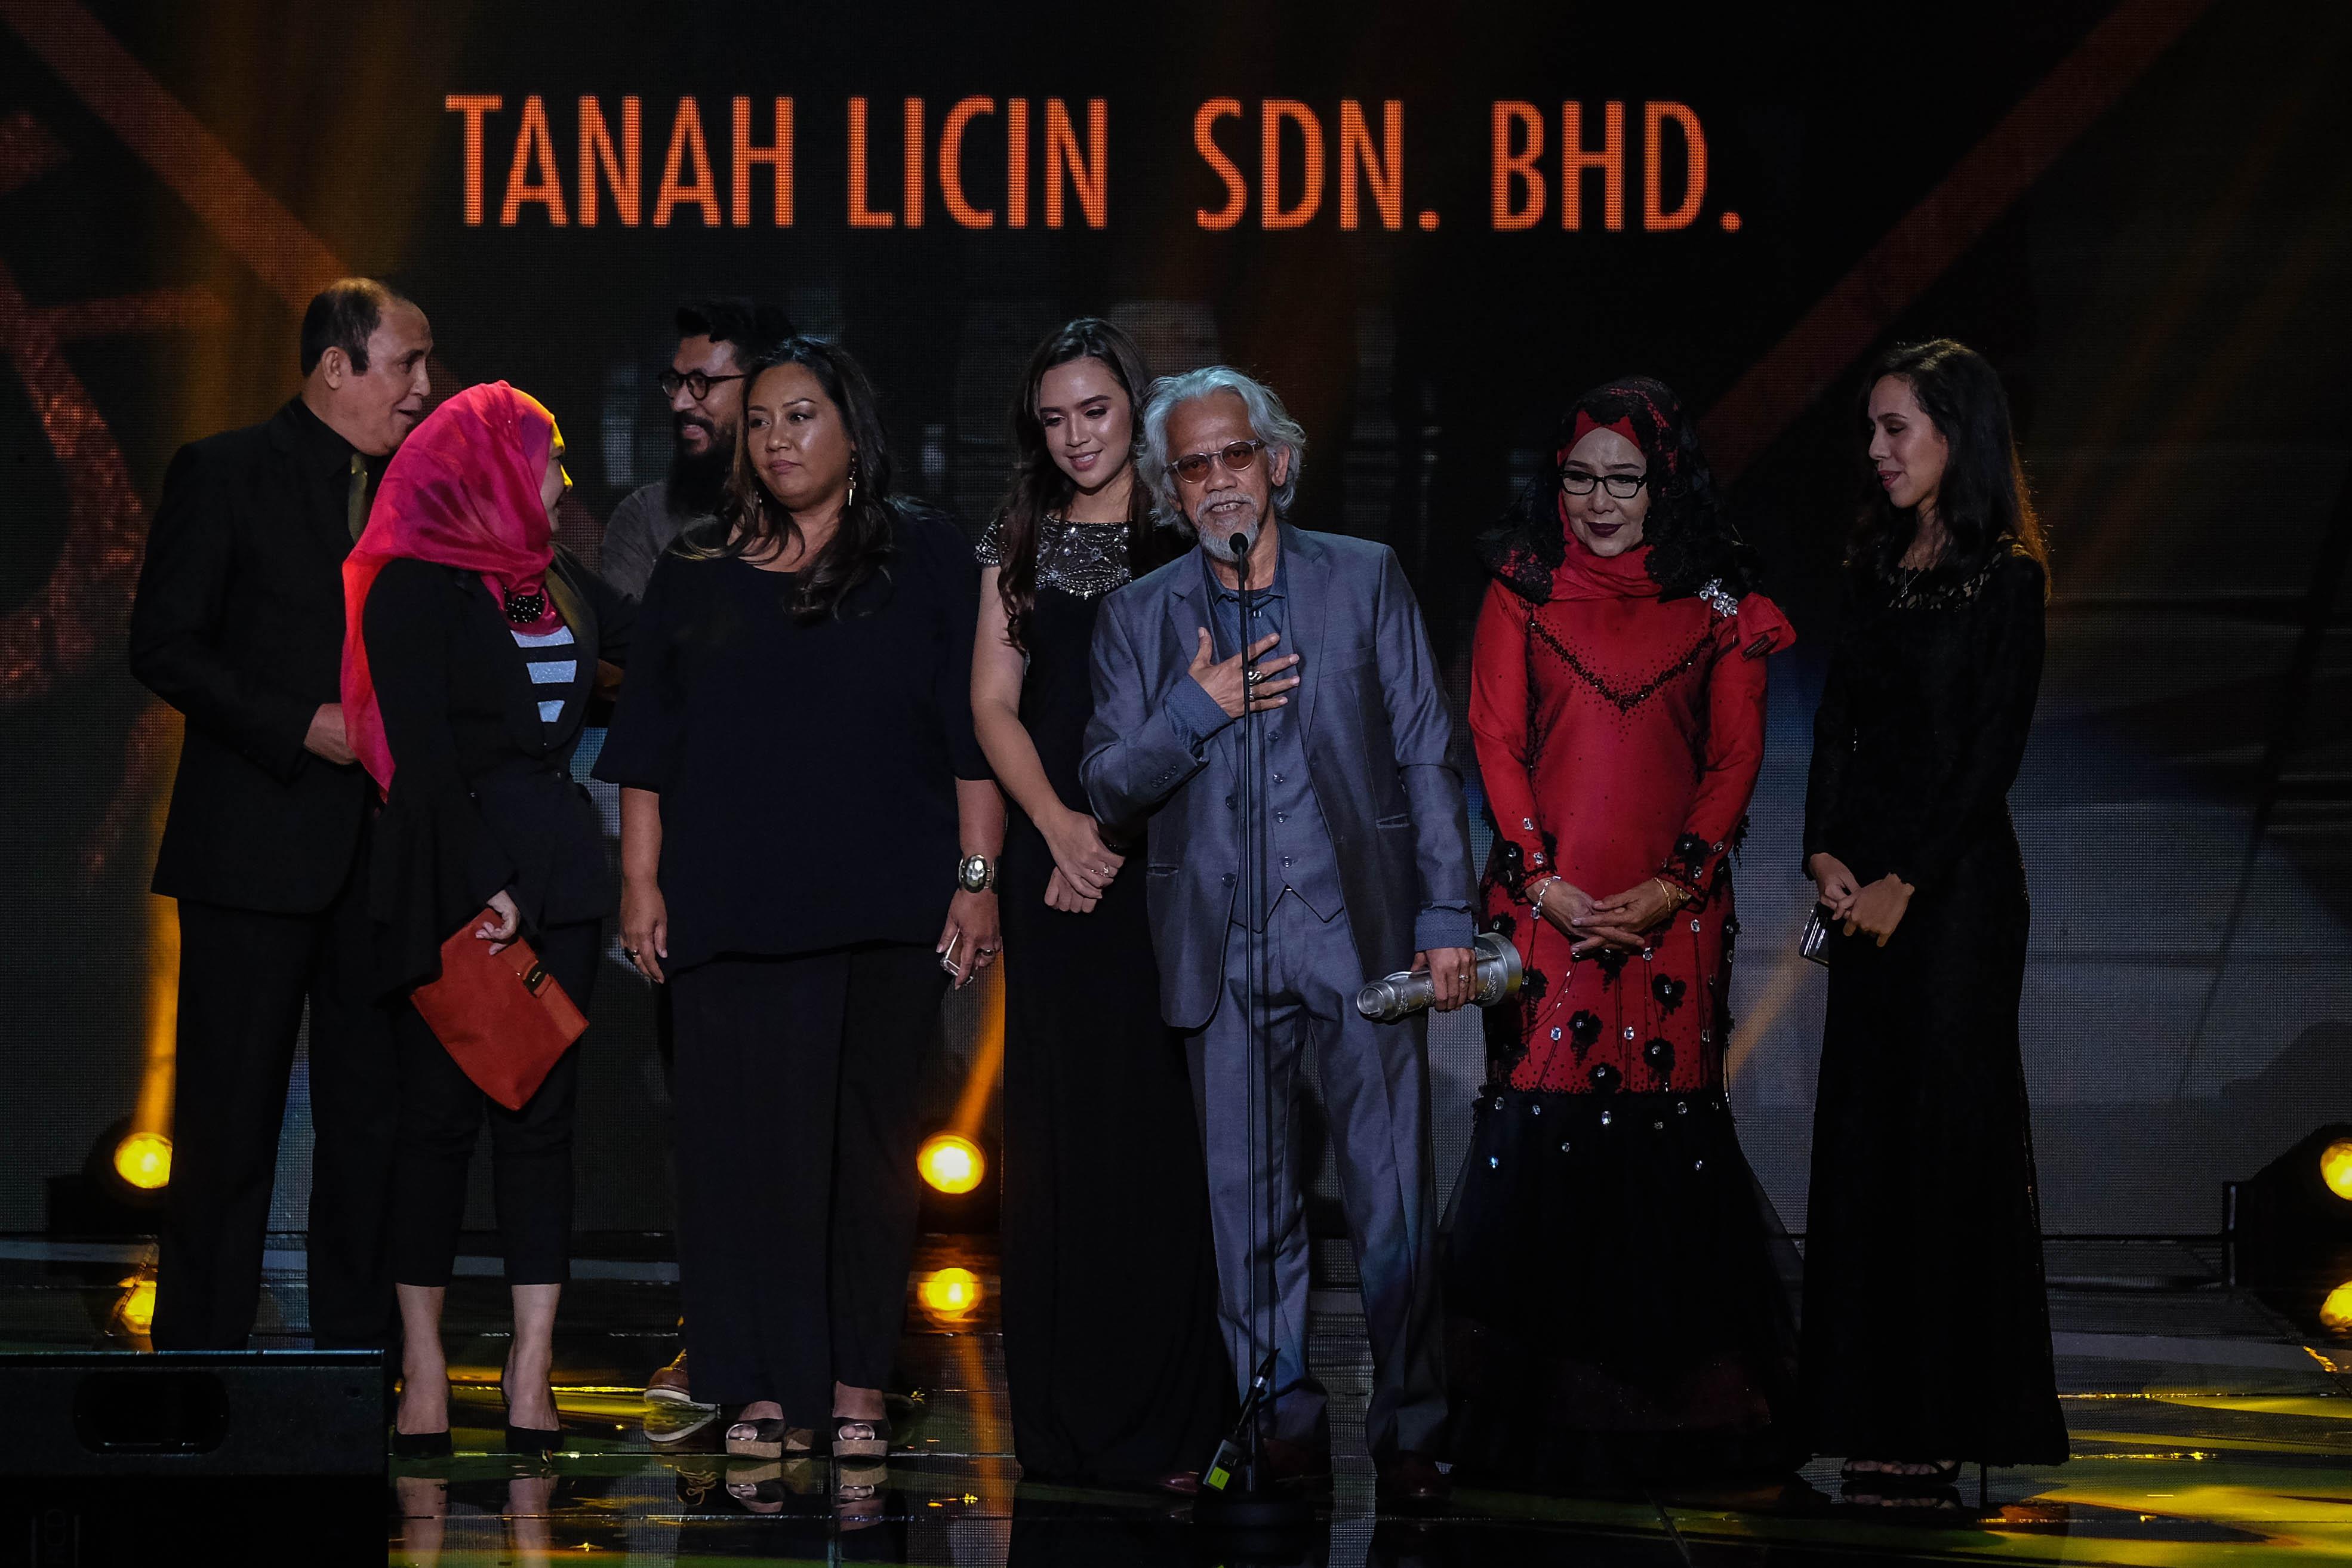 Drama Pesan Dari Tuhan ungguli anugerah ASK 2017